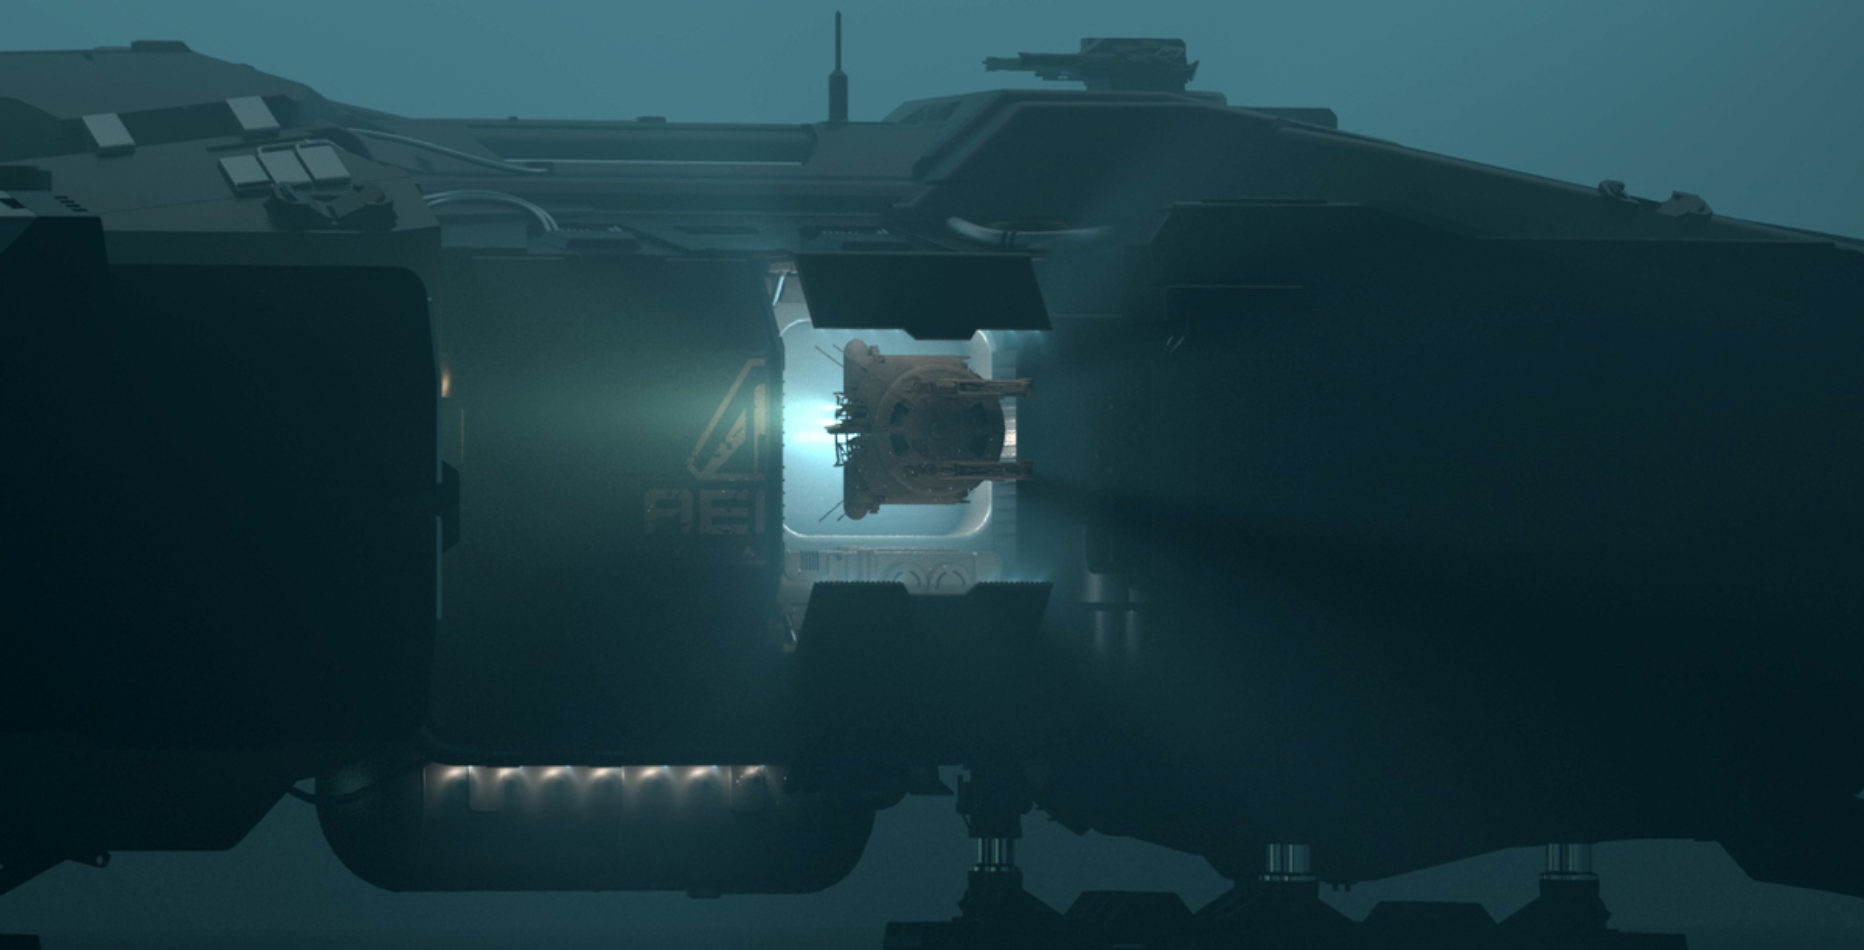 SC-Aegis-Vulcan-2-7.jpg